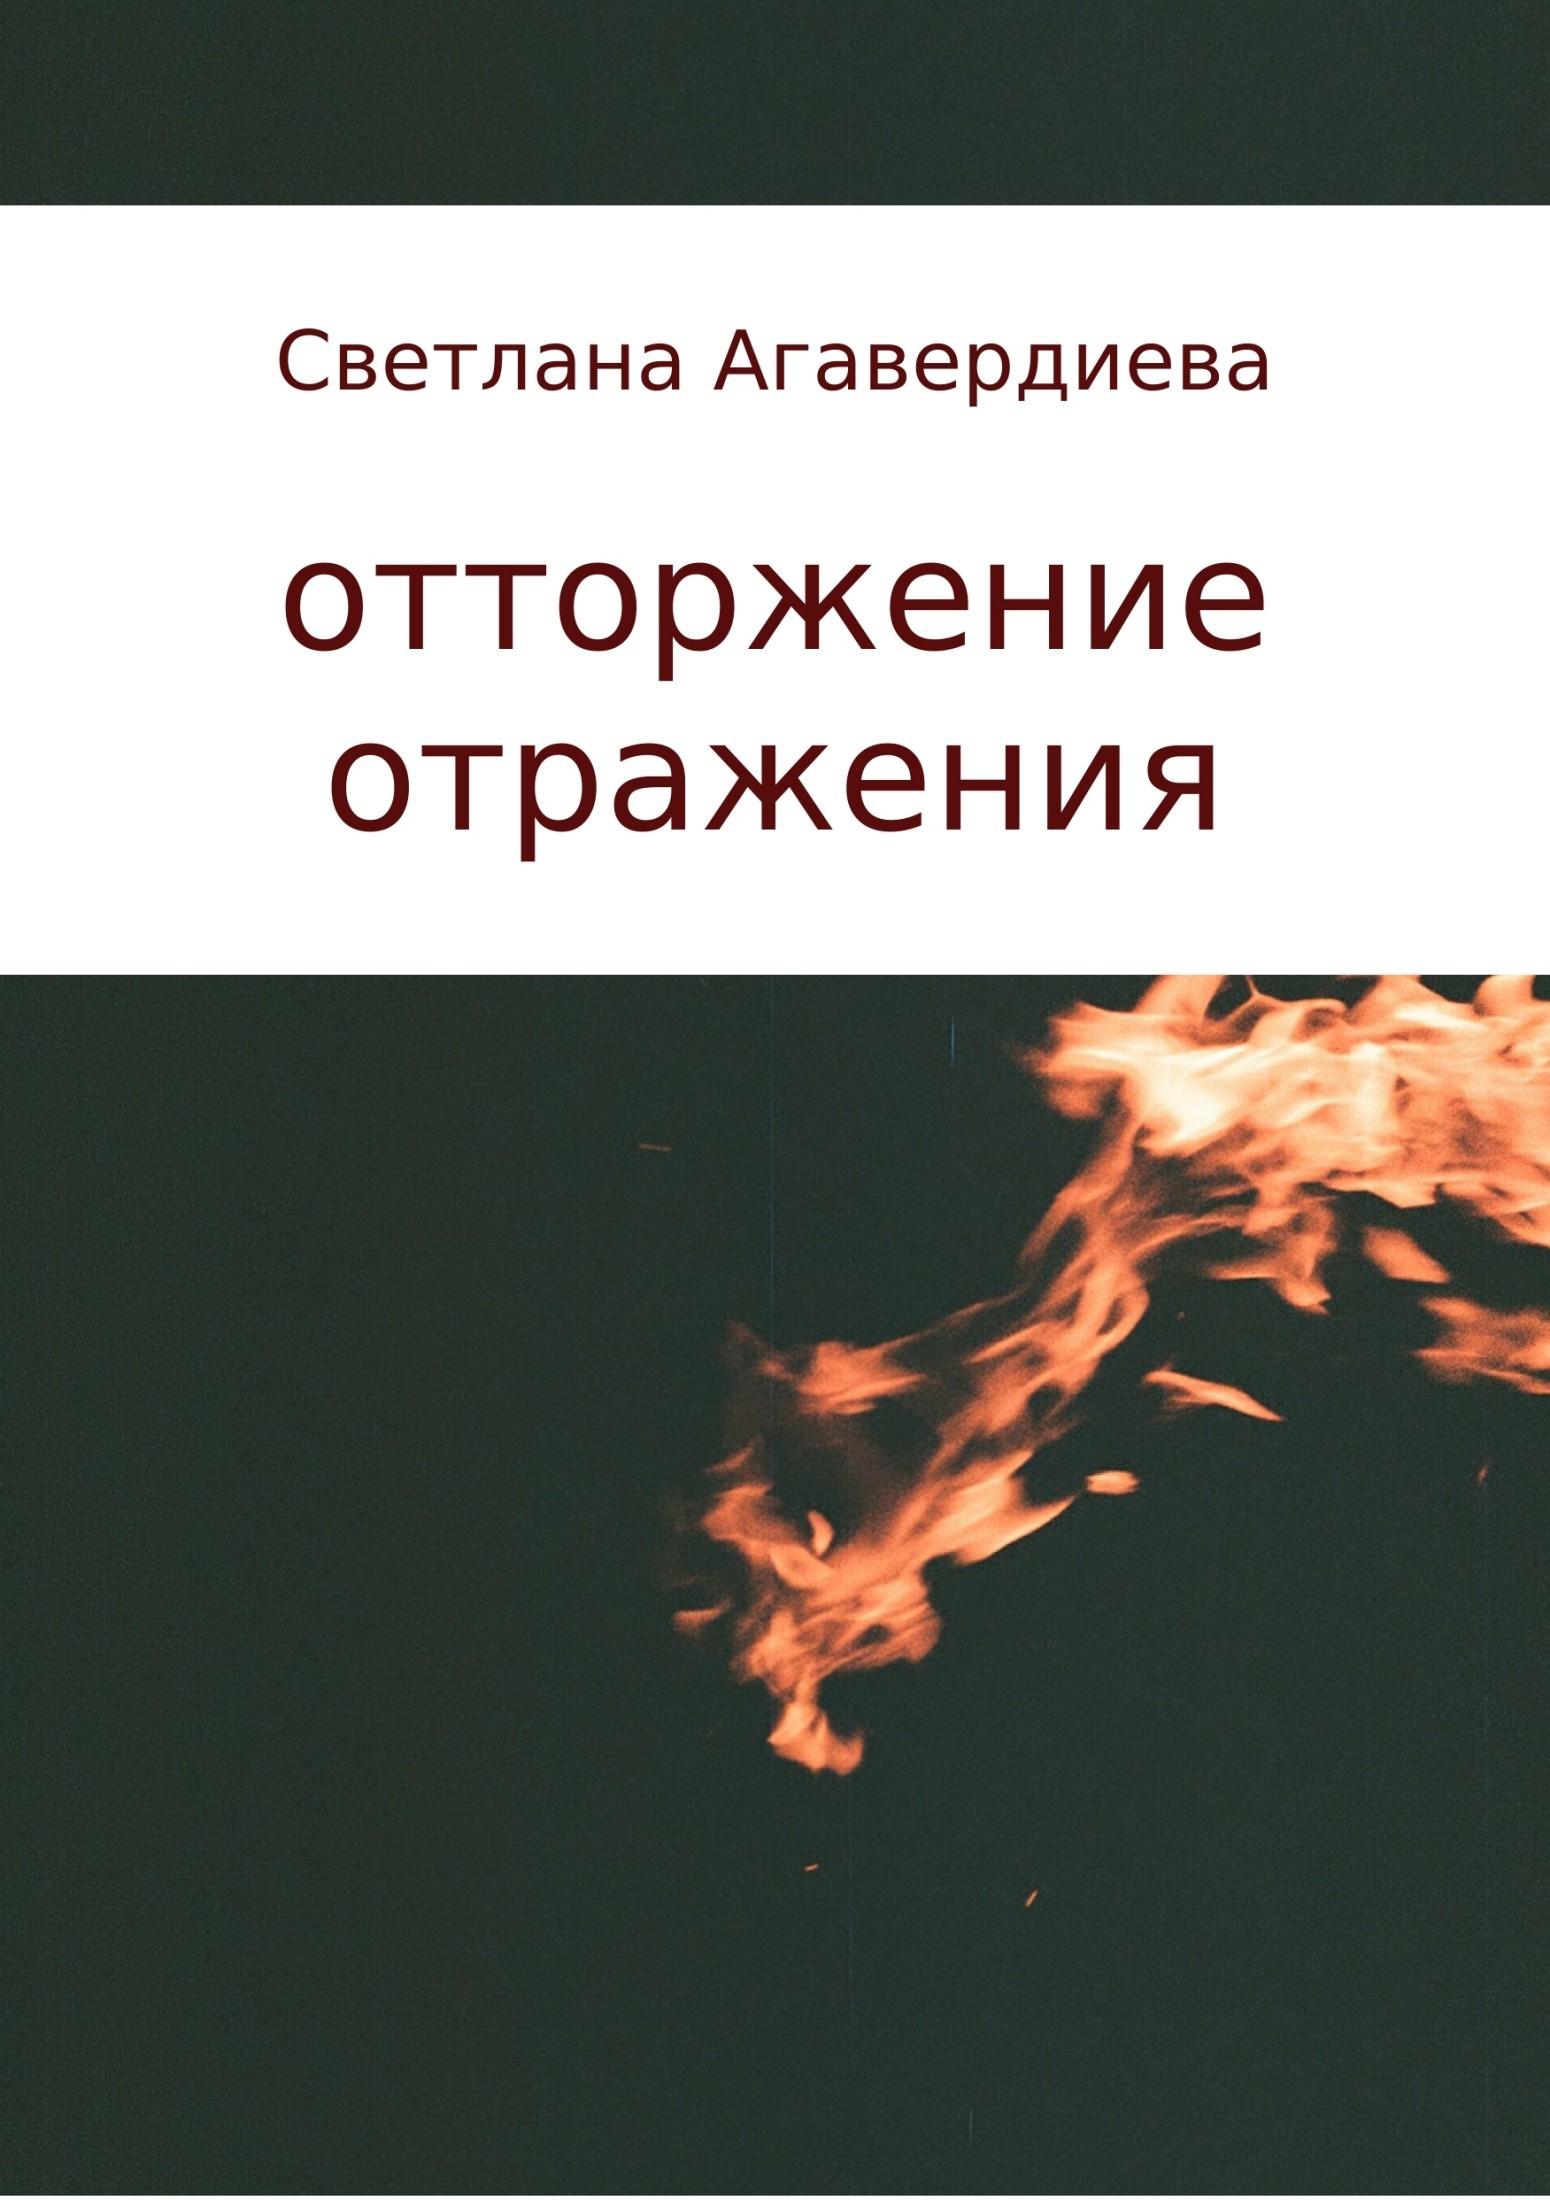 Светлана Расифовна Агавердиева отторжение отражения. сборник стихов елена назарова я не завишу от часов сборник стихов